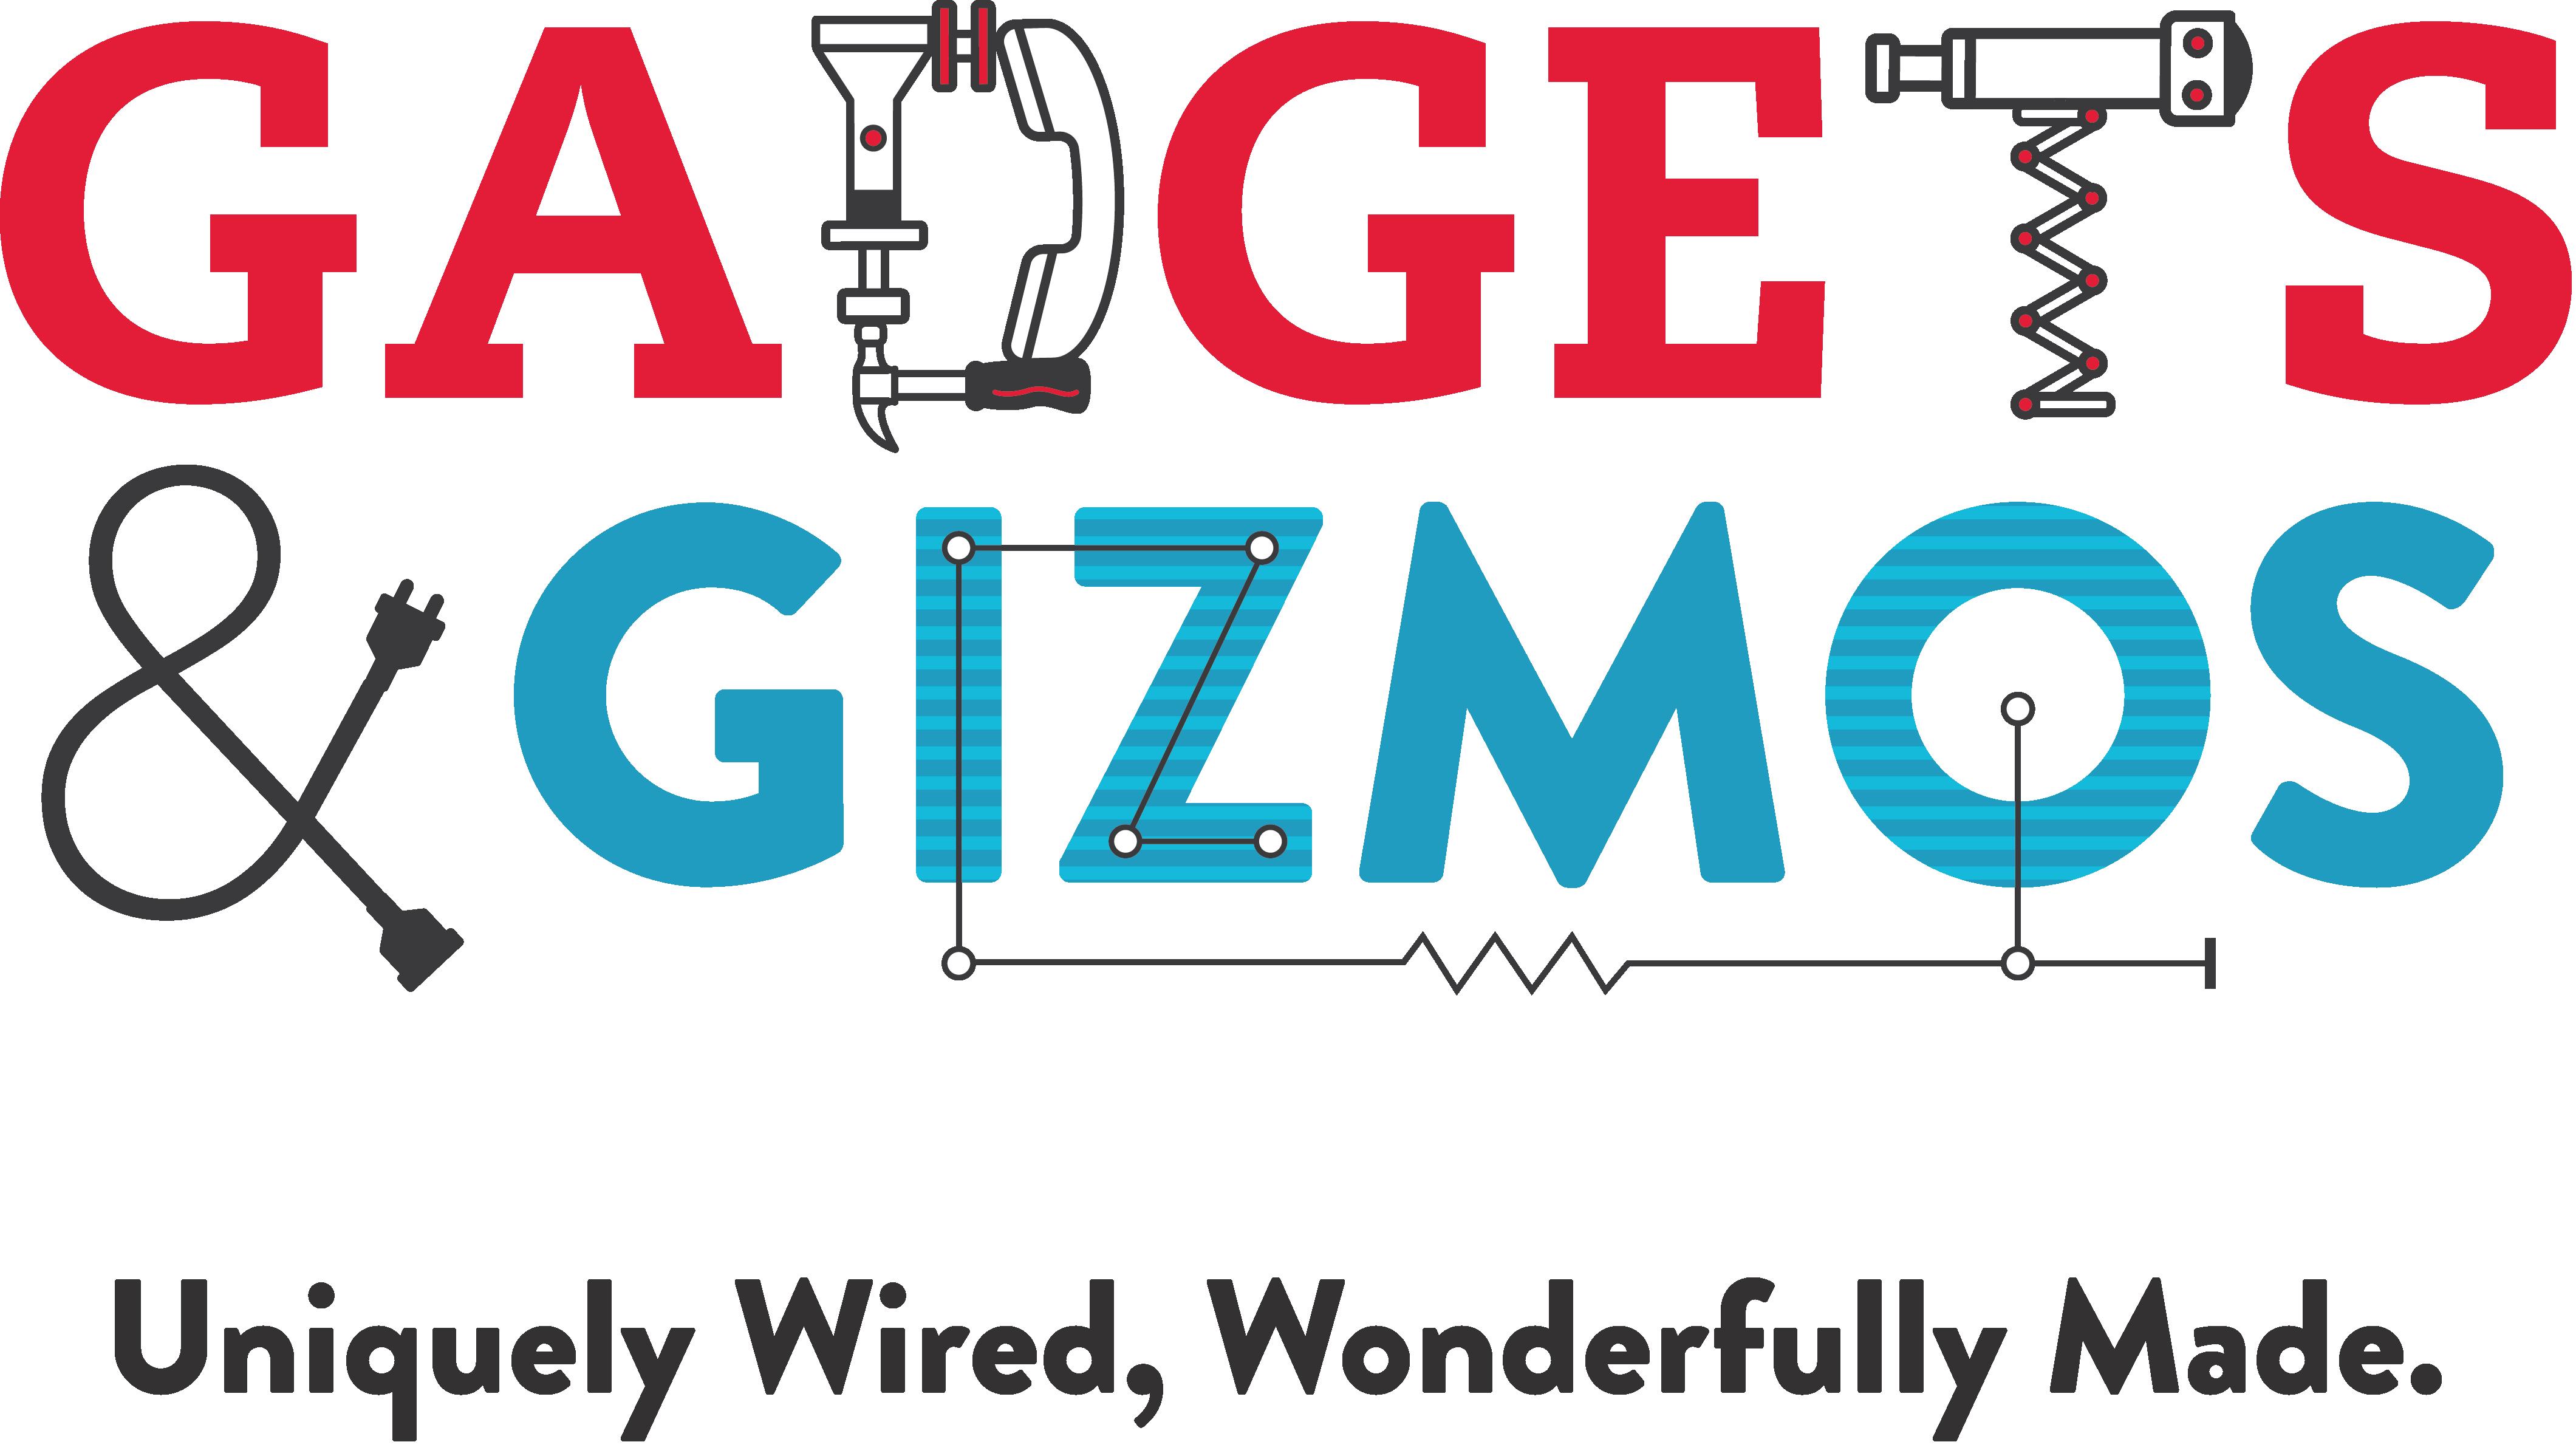 Gg logo tagline color